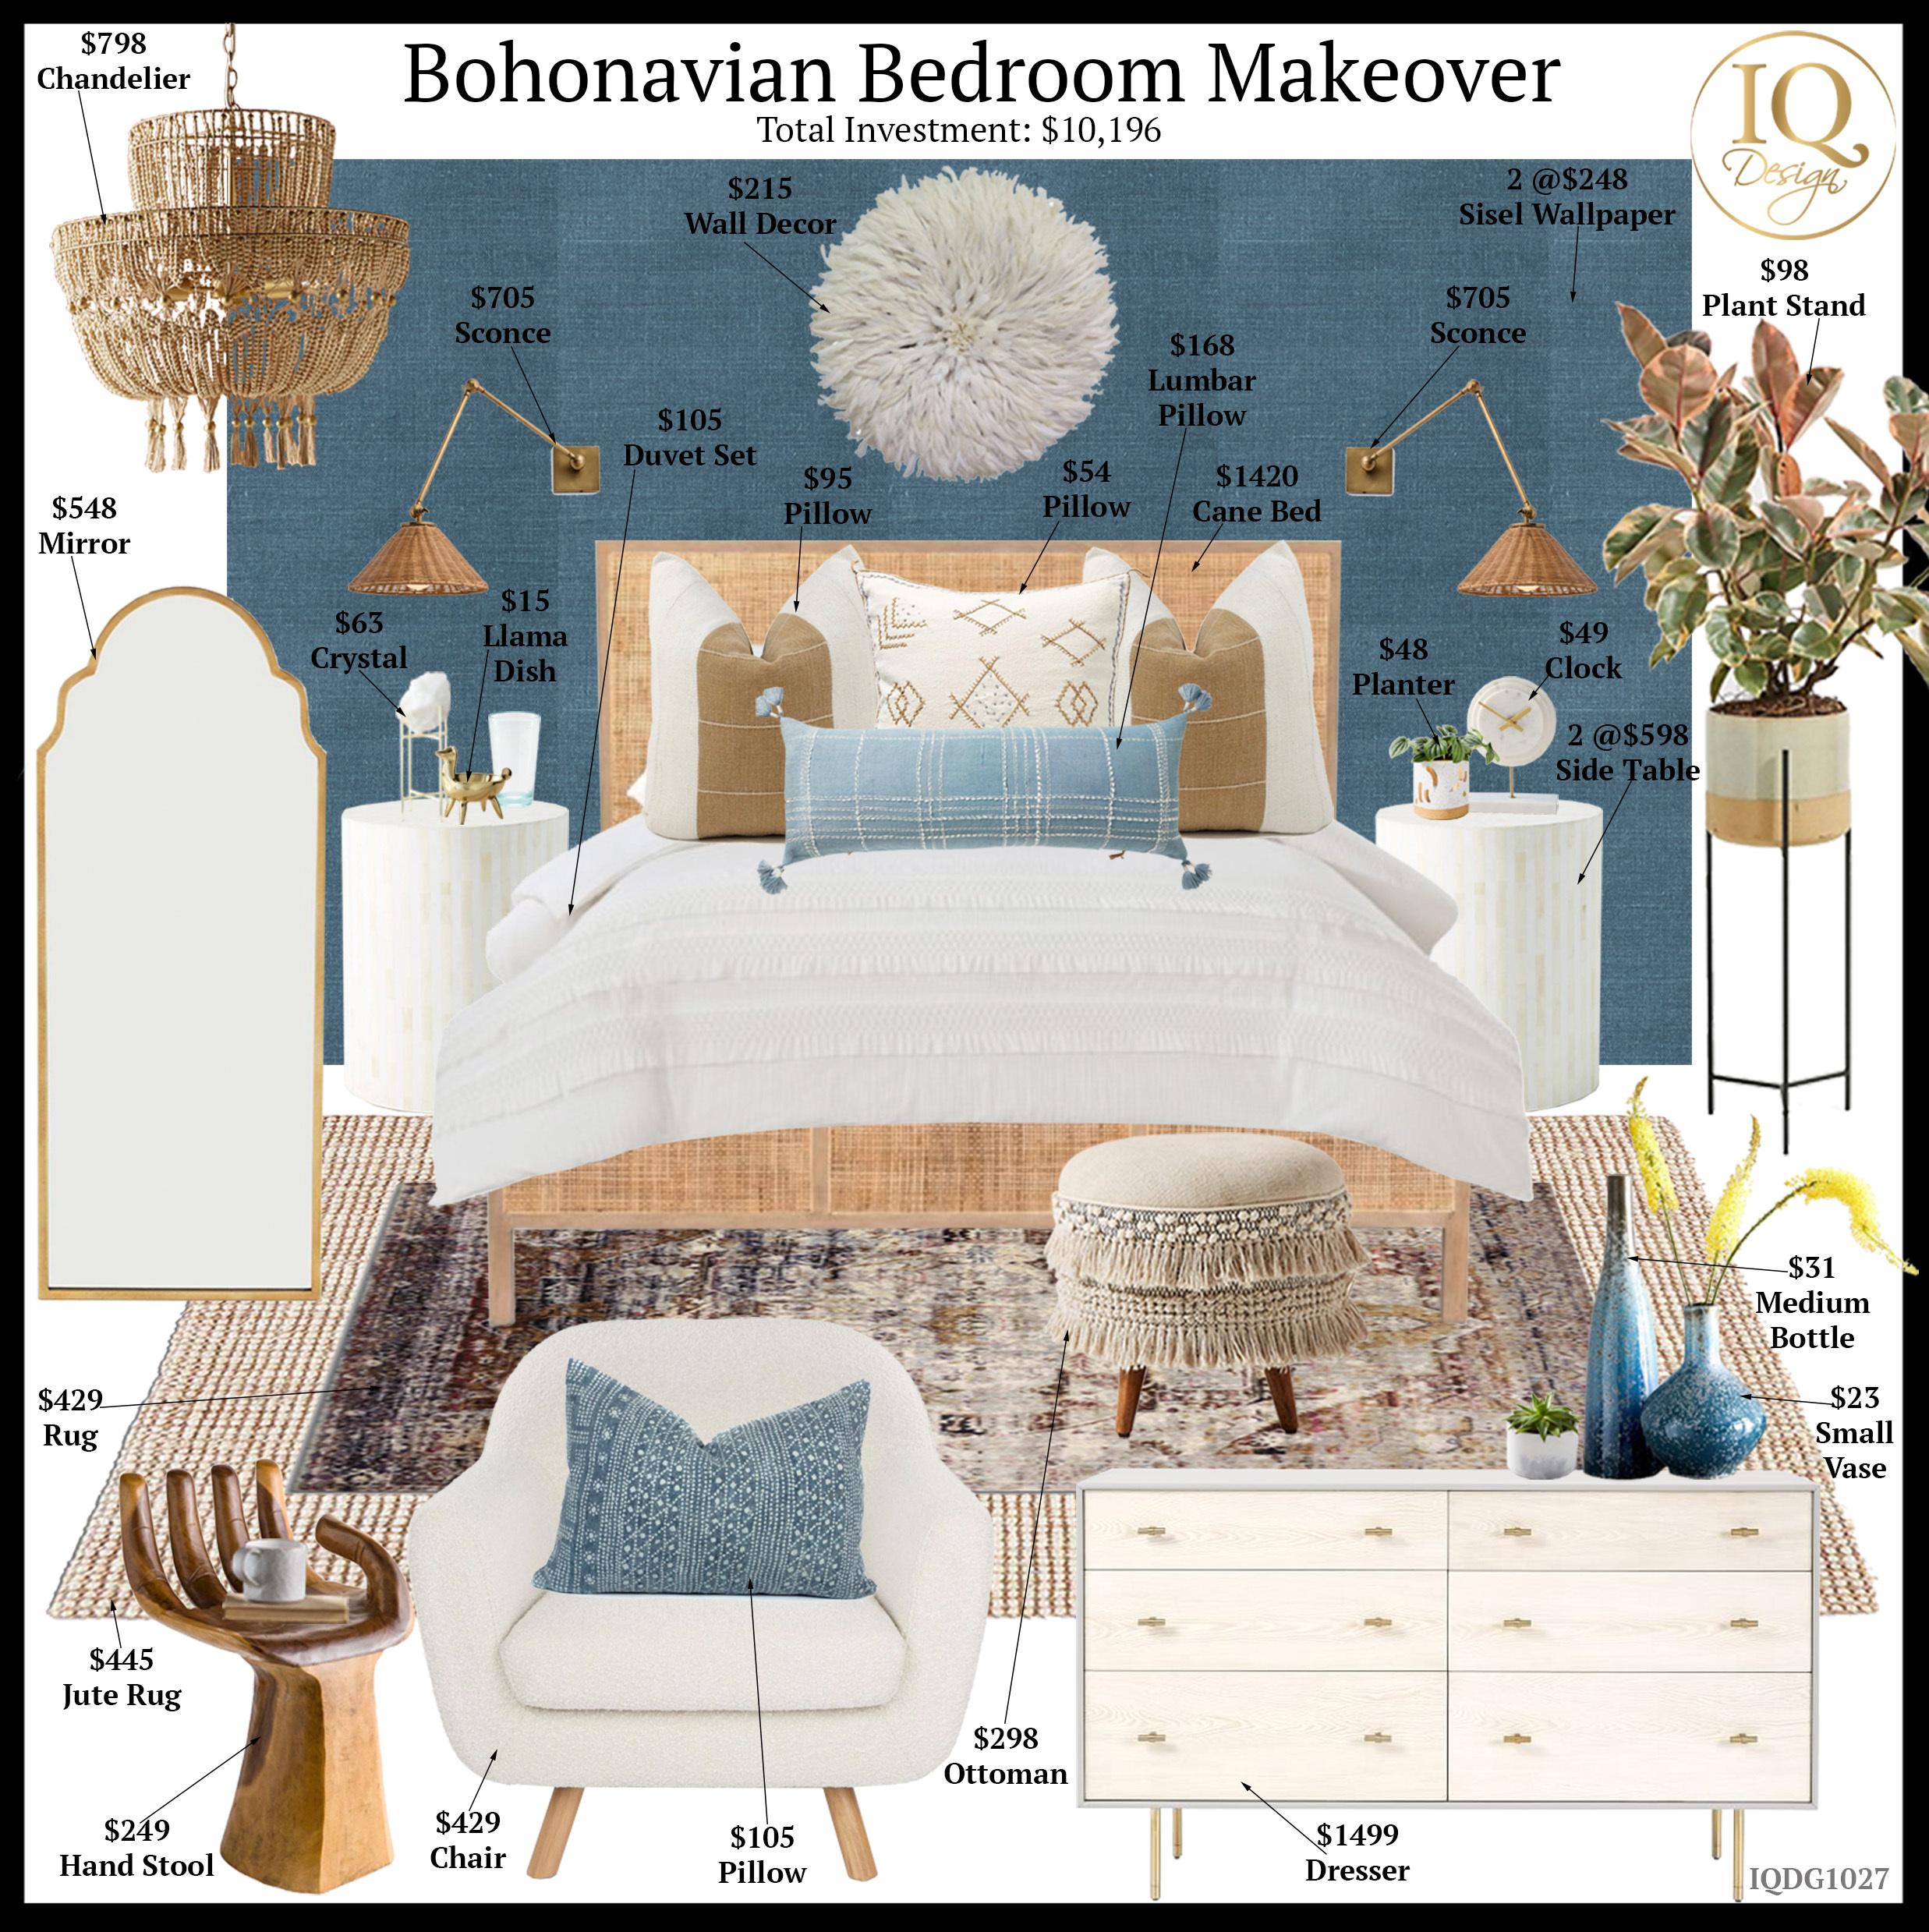 IQDG1027_K Airbnb BedroomHR.jpg